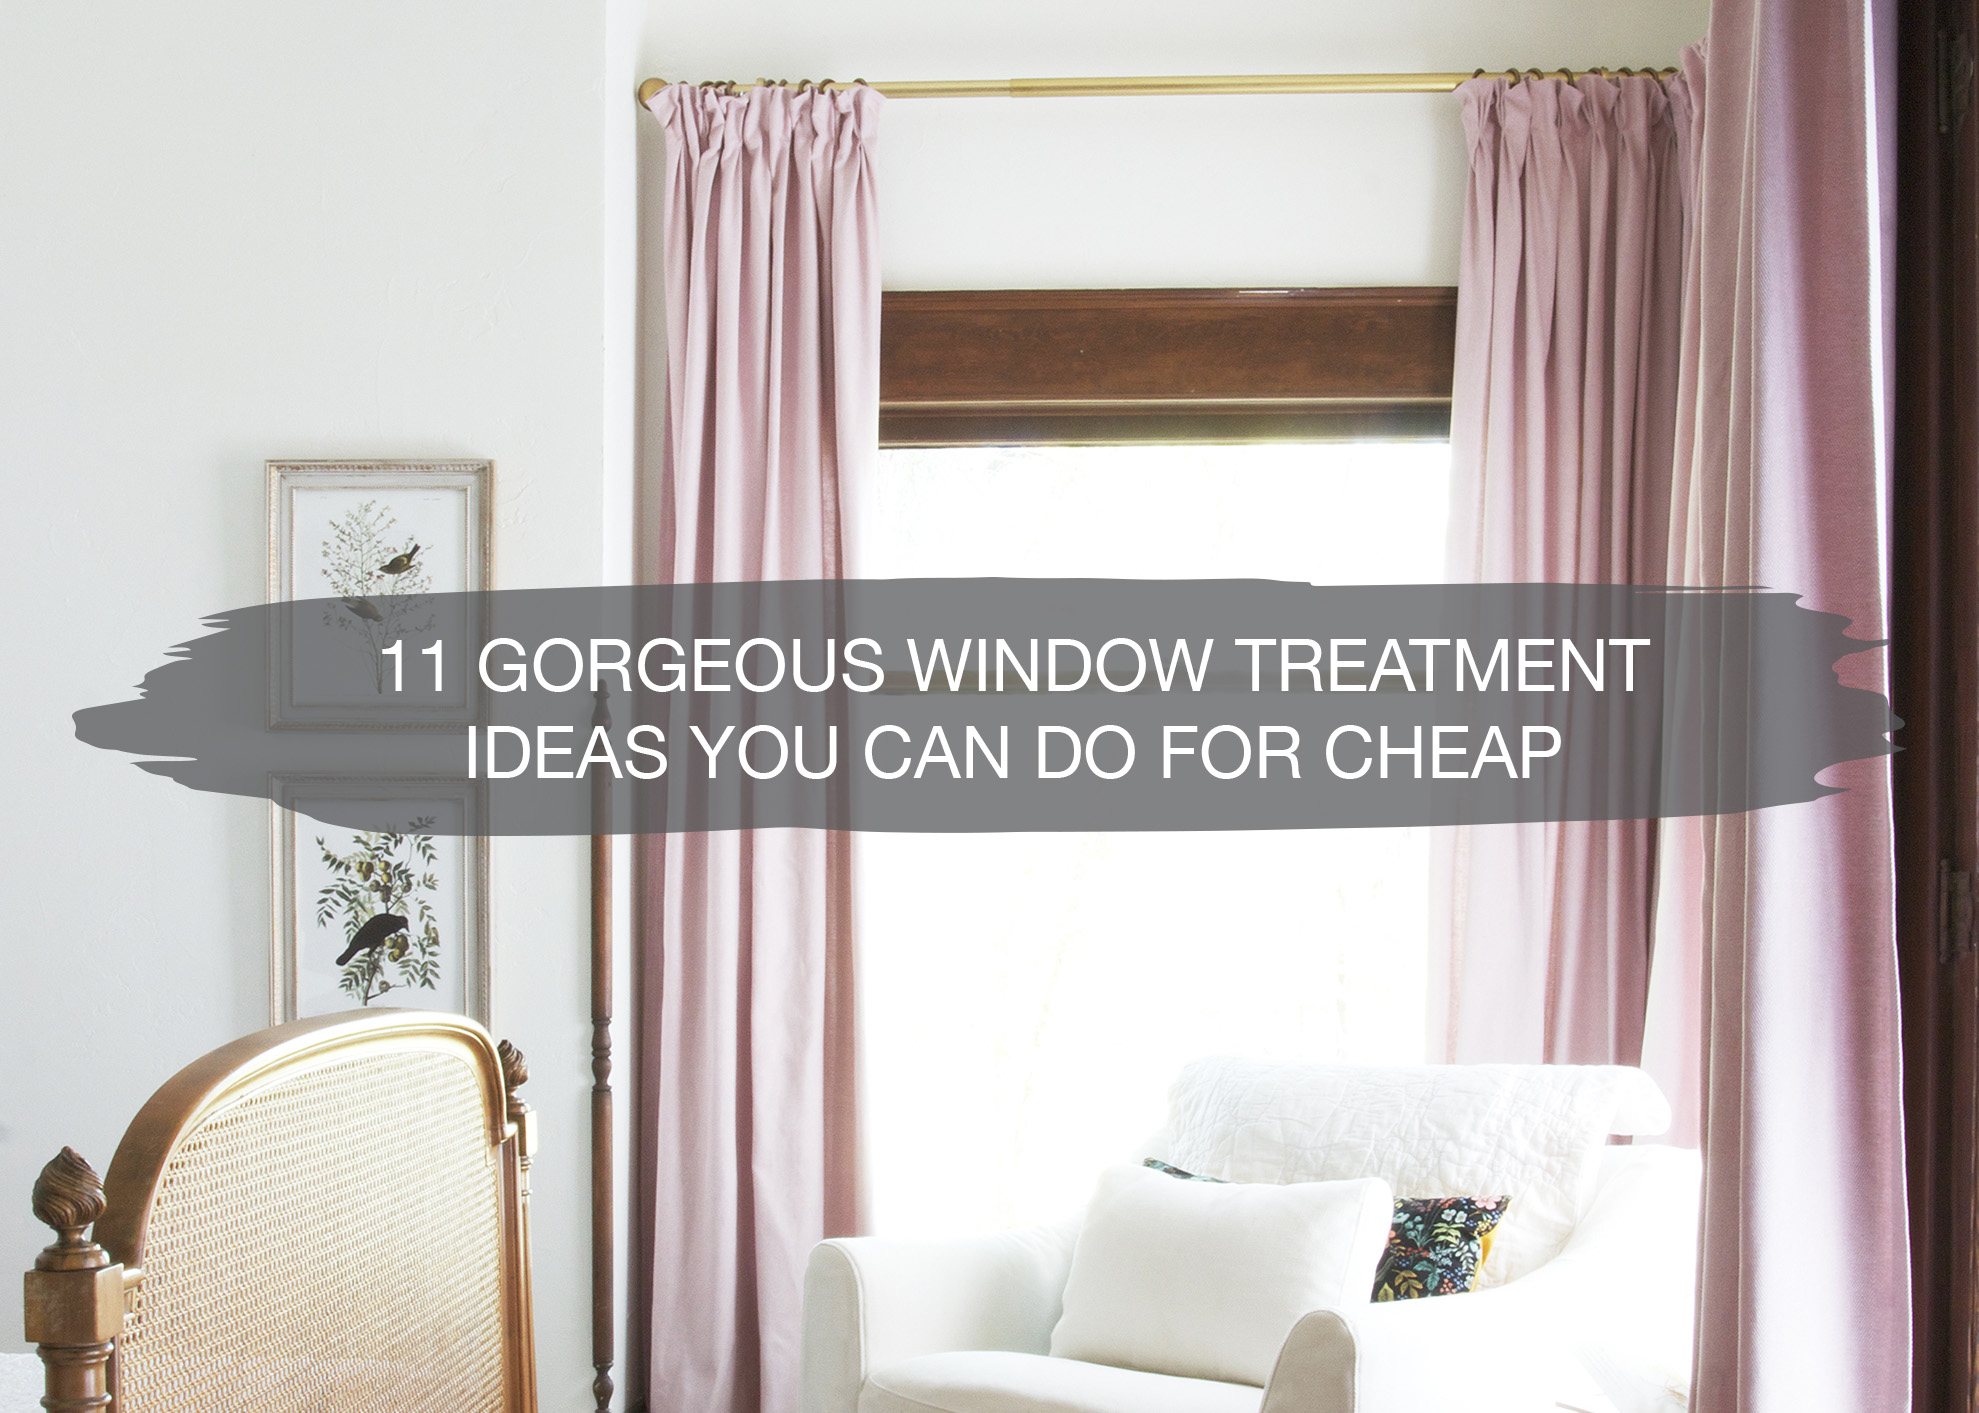 11 diy window treatment ideas cheap